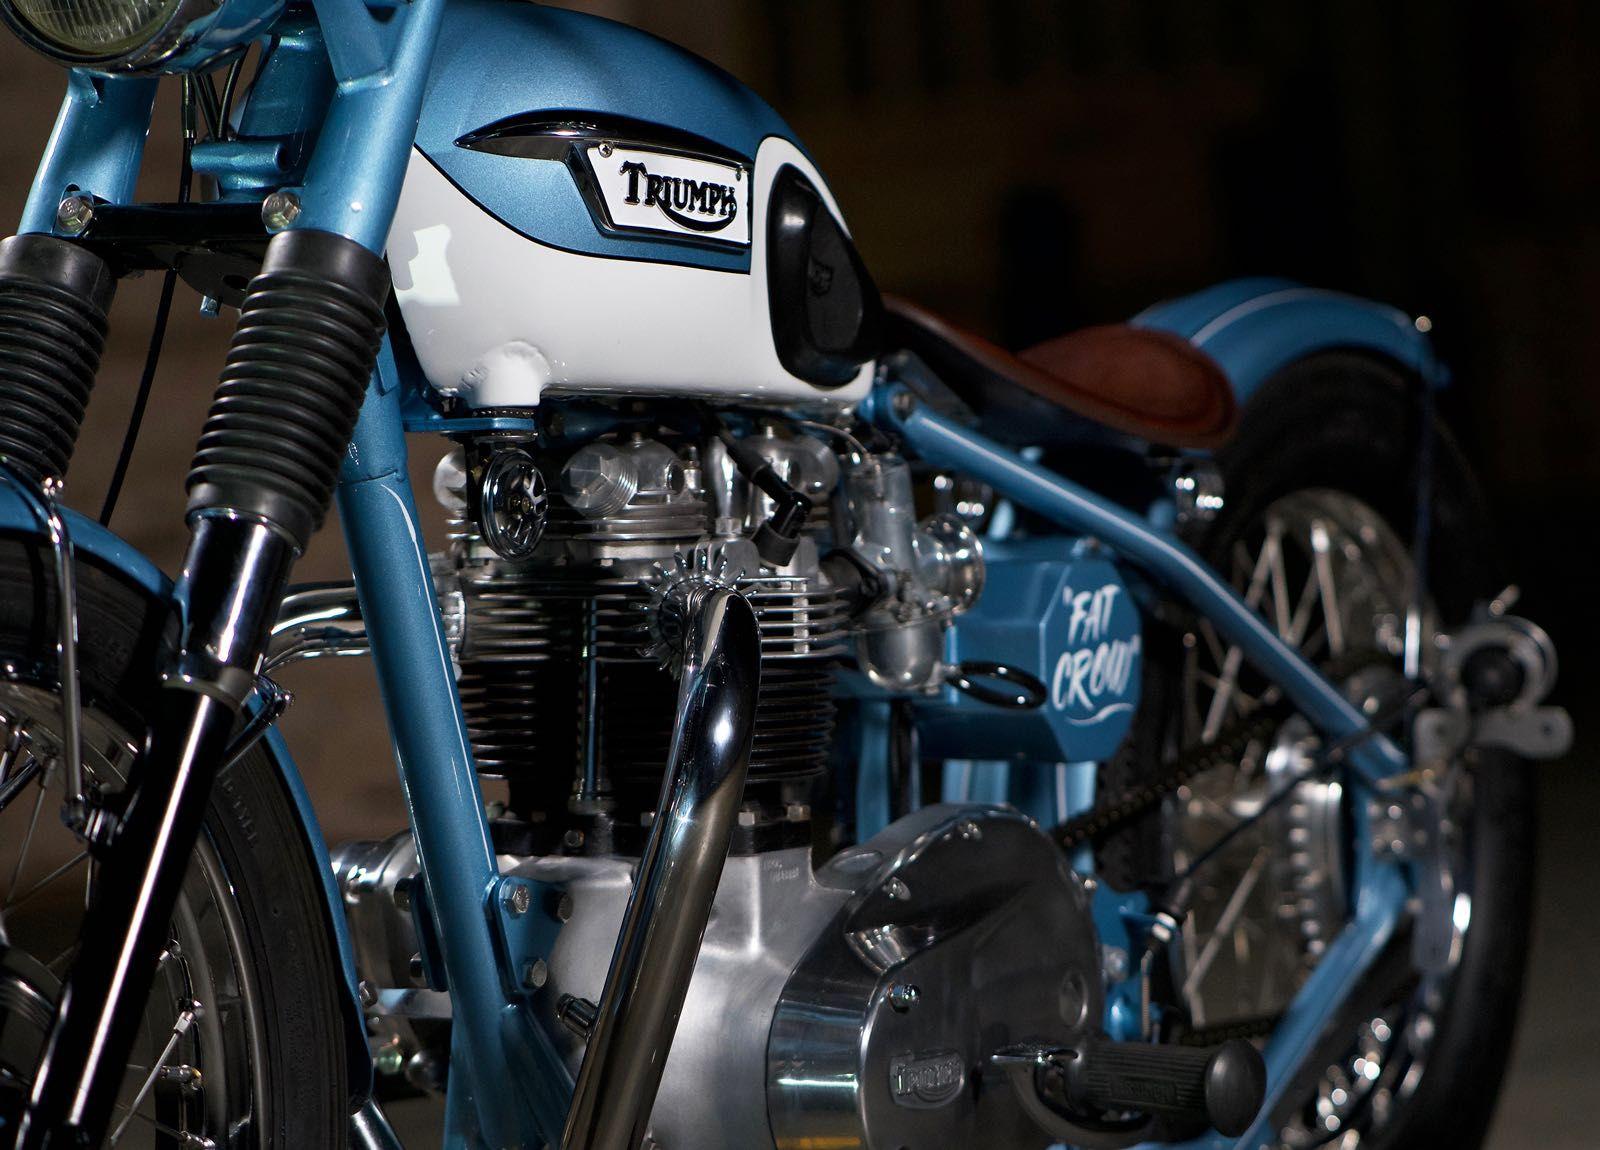 Pin on Triumph bobber